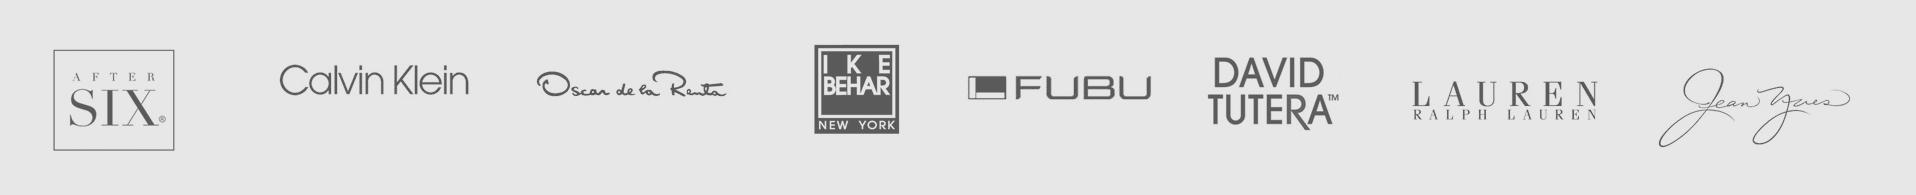 example-logos